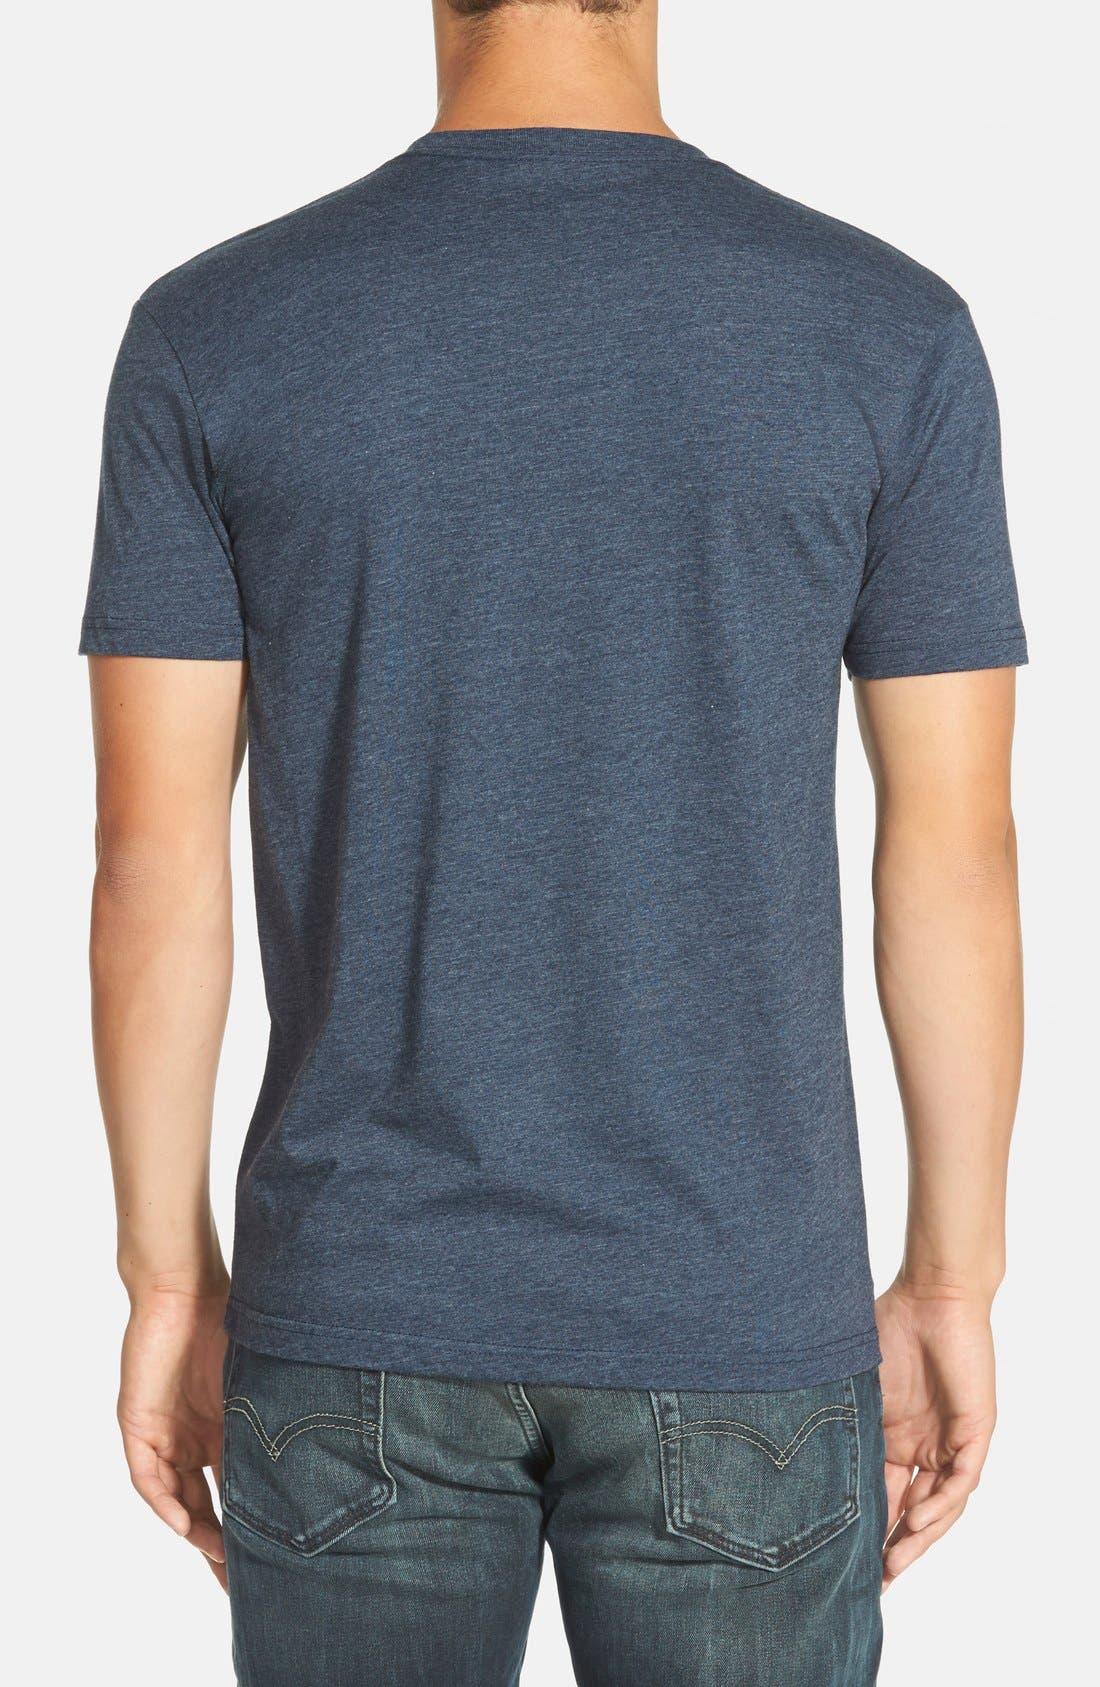 'Ace Ventura Tutu' Graphic T-Shirt,                             Alternate thumbnail 2, color,                             410